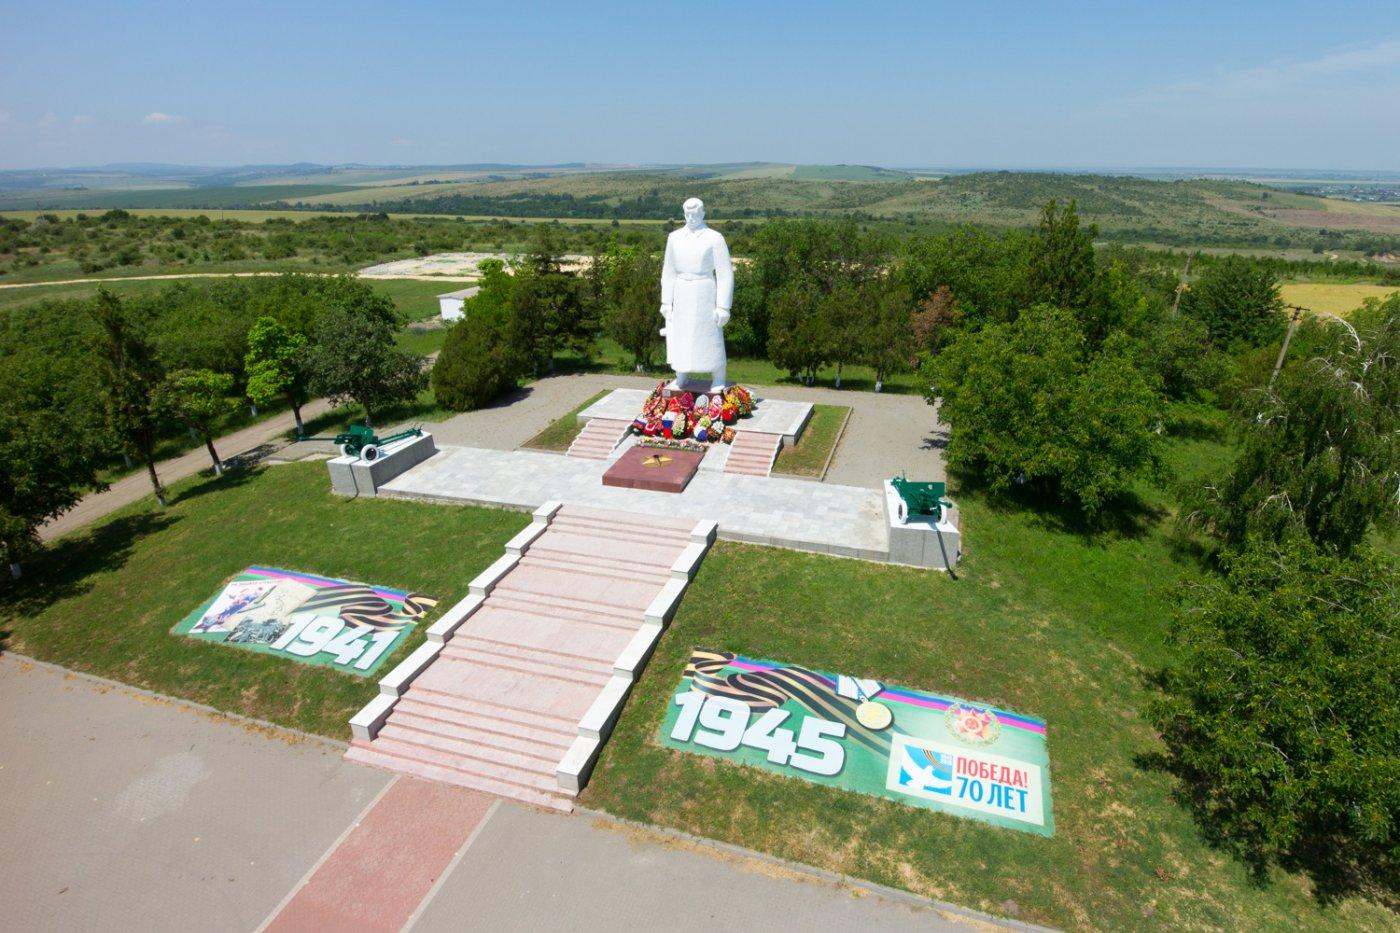 Фото Сопка героев. Россия, Краснодарский край, Unnamed Road